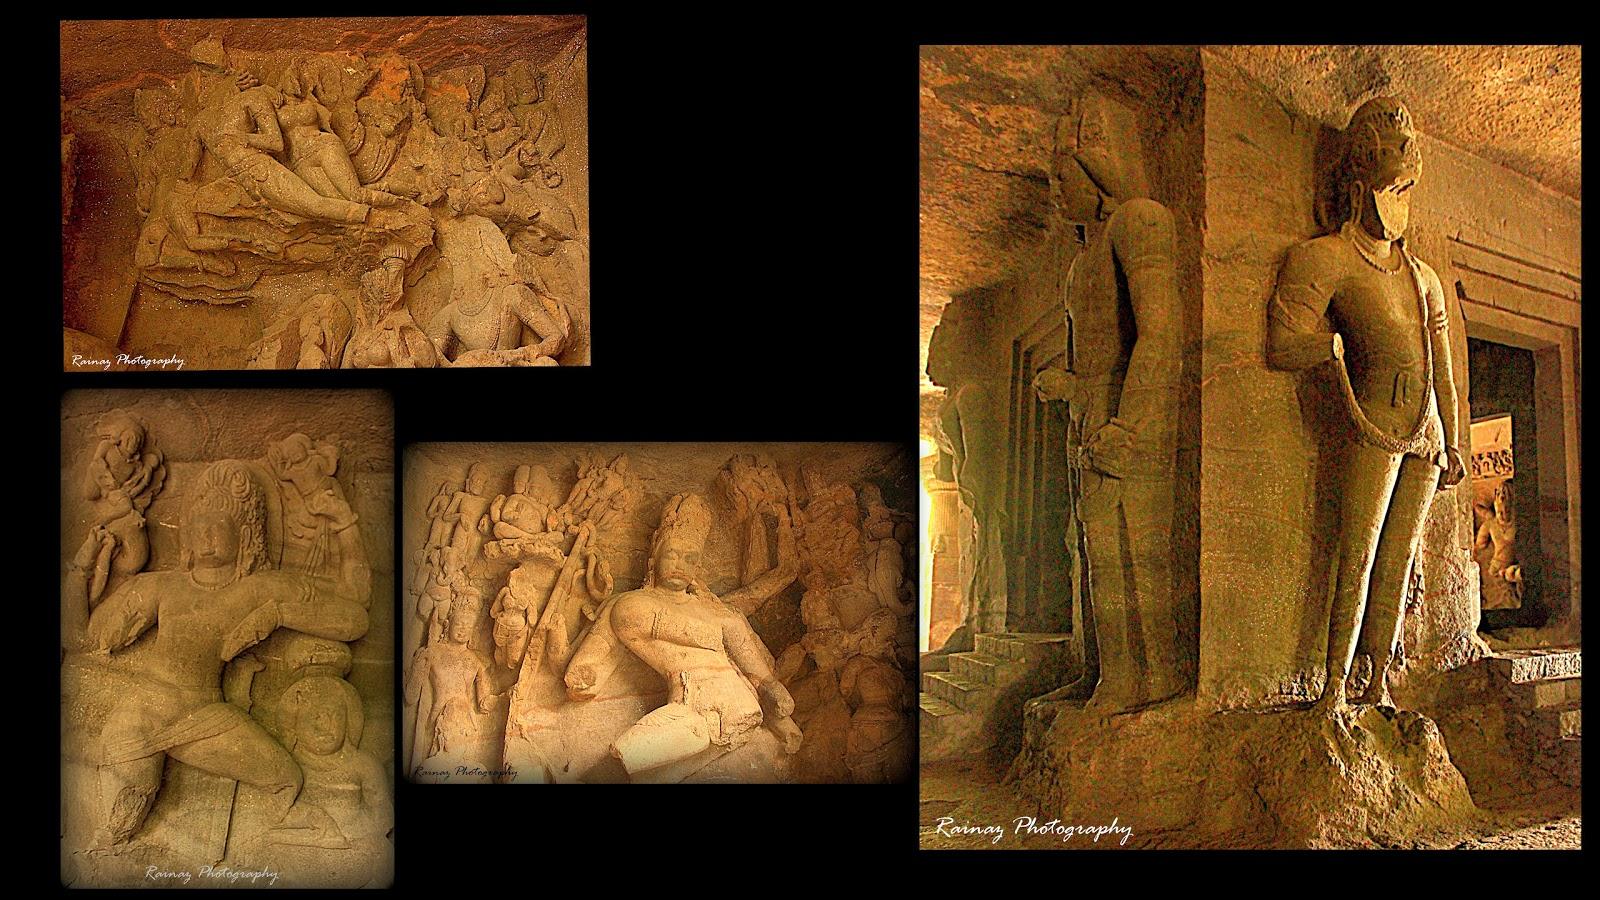 elephanta caves paintings - photo #15